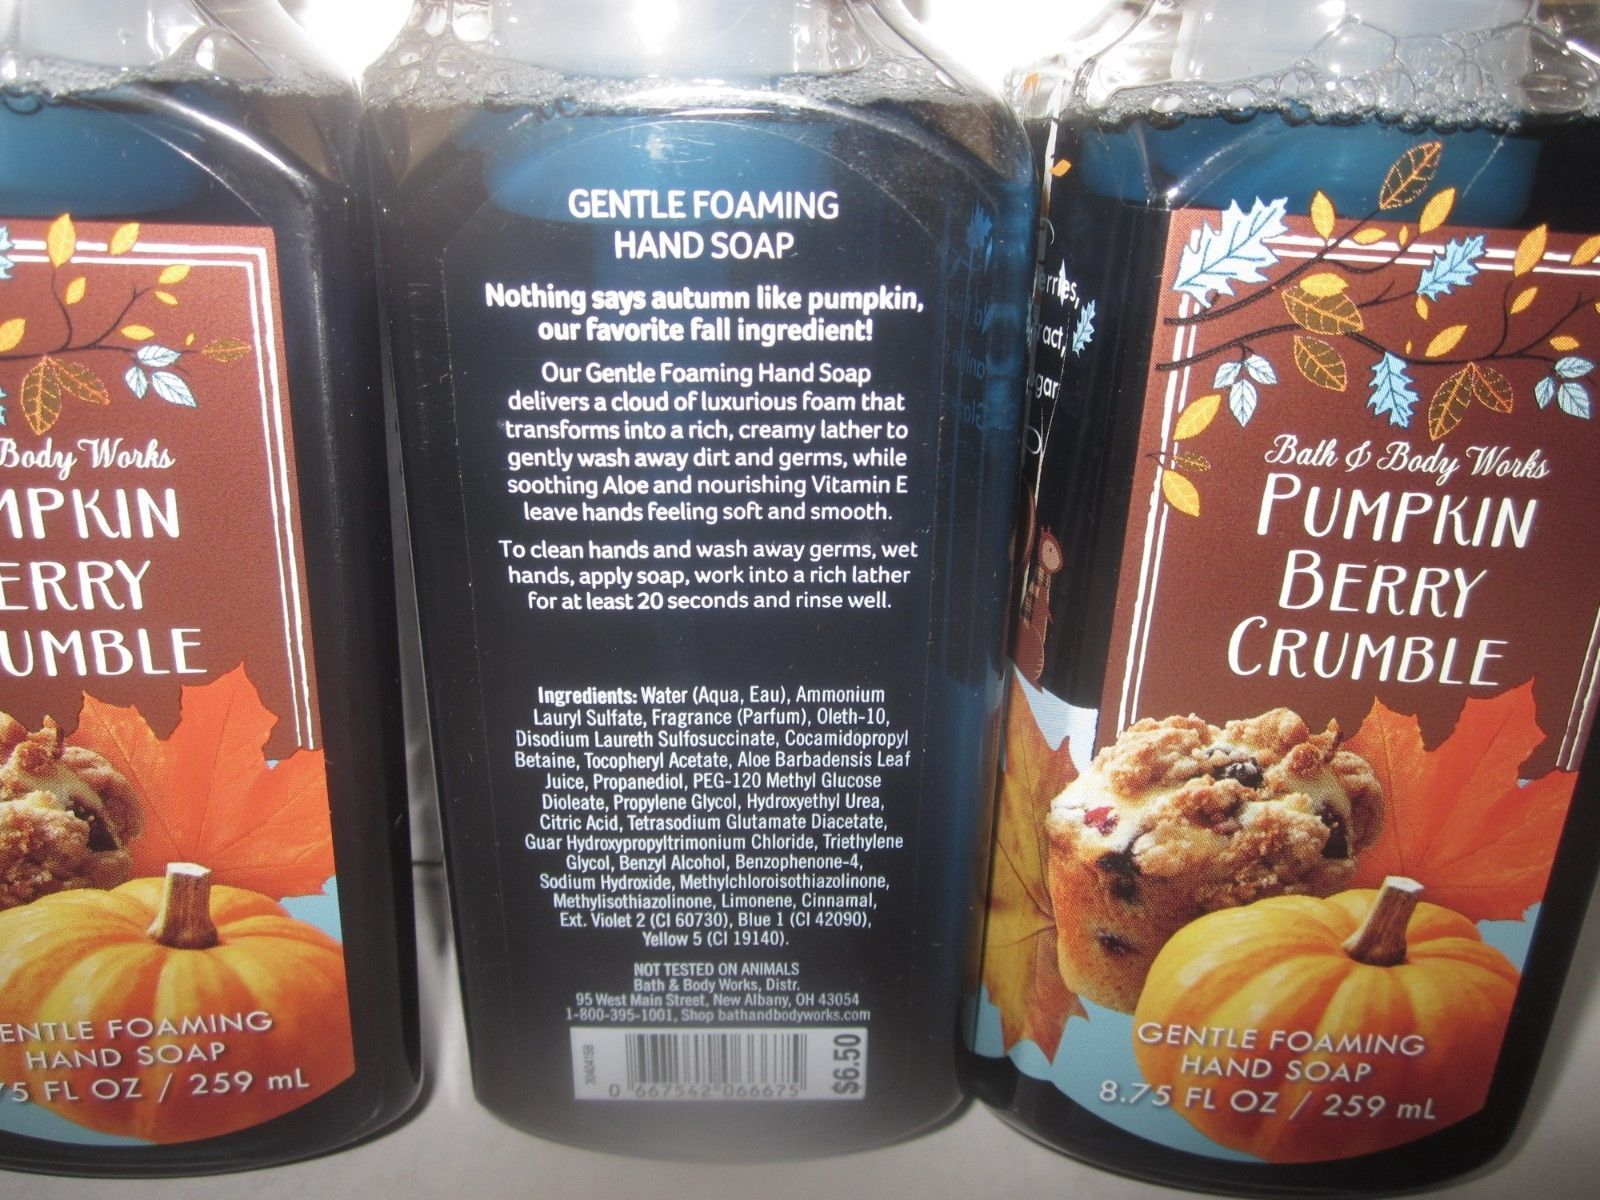 3 Bath & Body Works Gentle Foaming Hand Soap Pumpkin Berry Crumble